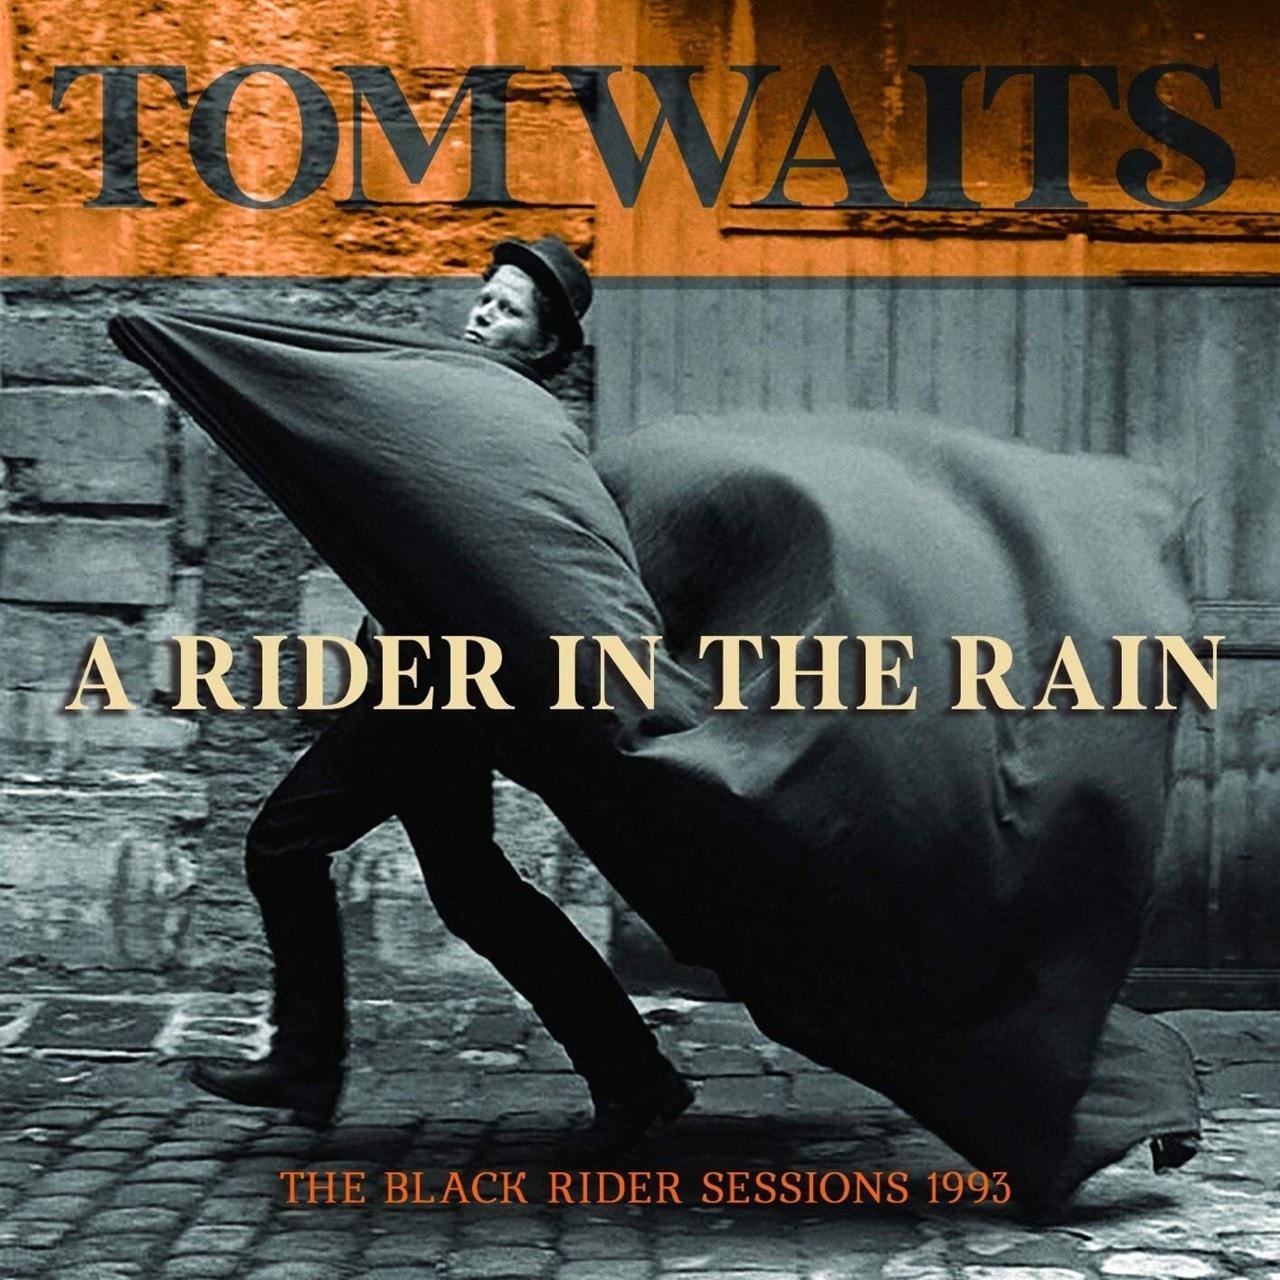 A Rider in the Rain: The Black Rider Sessions 1993 - 1